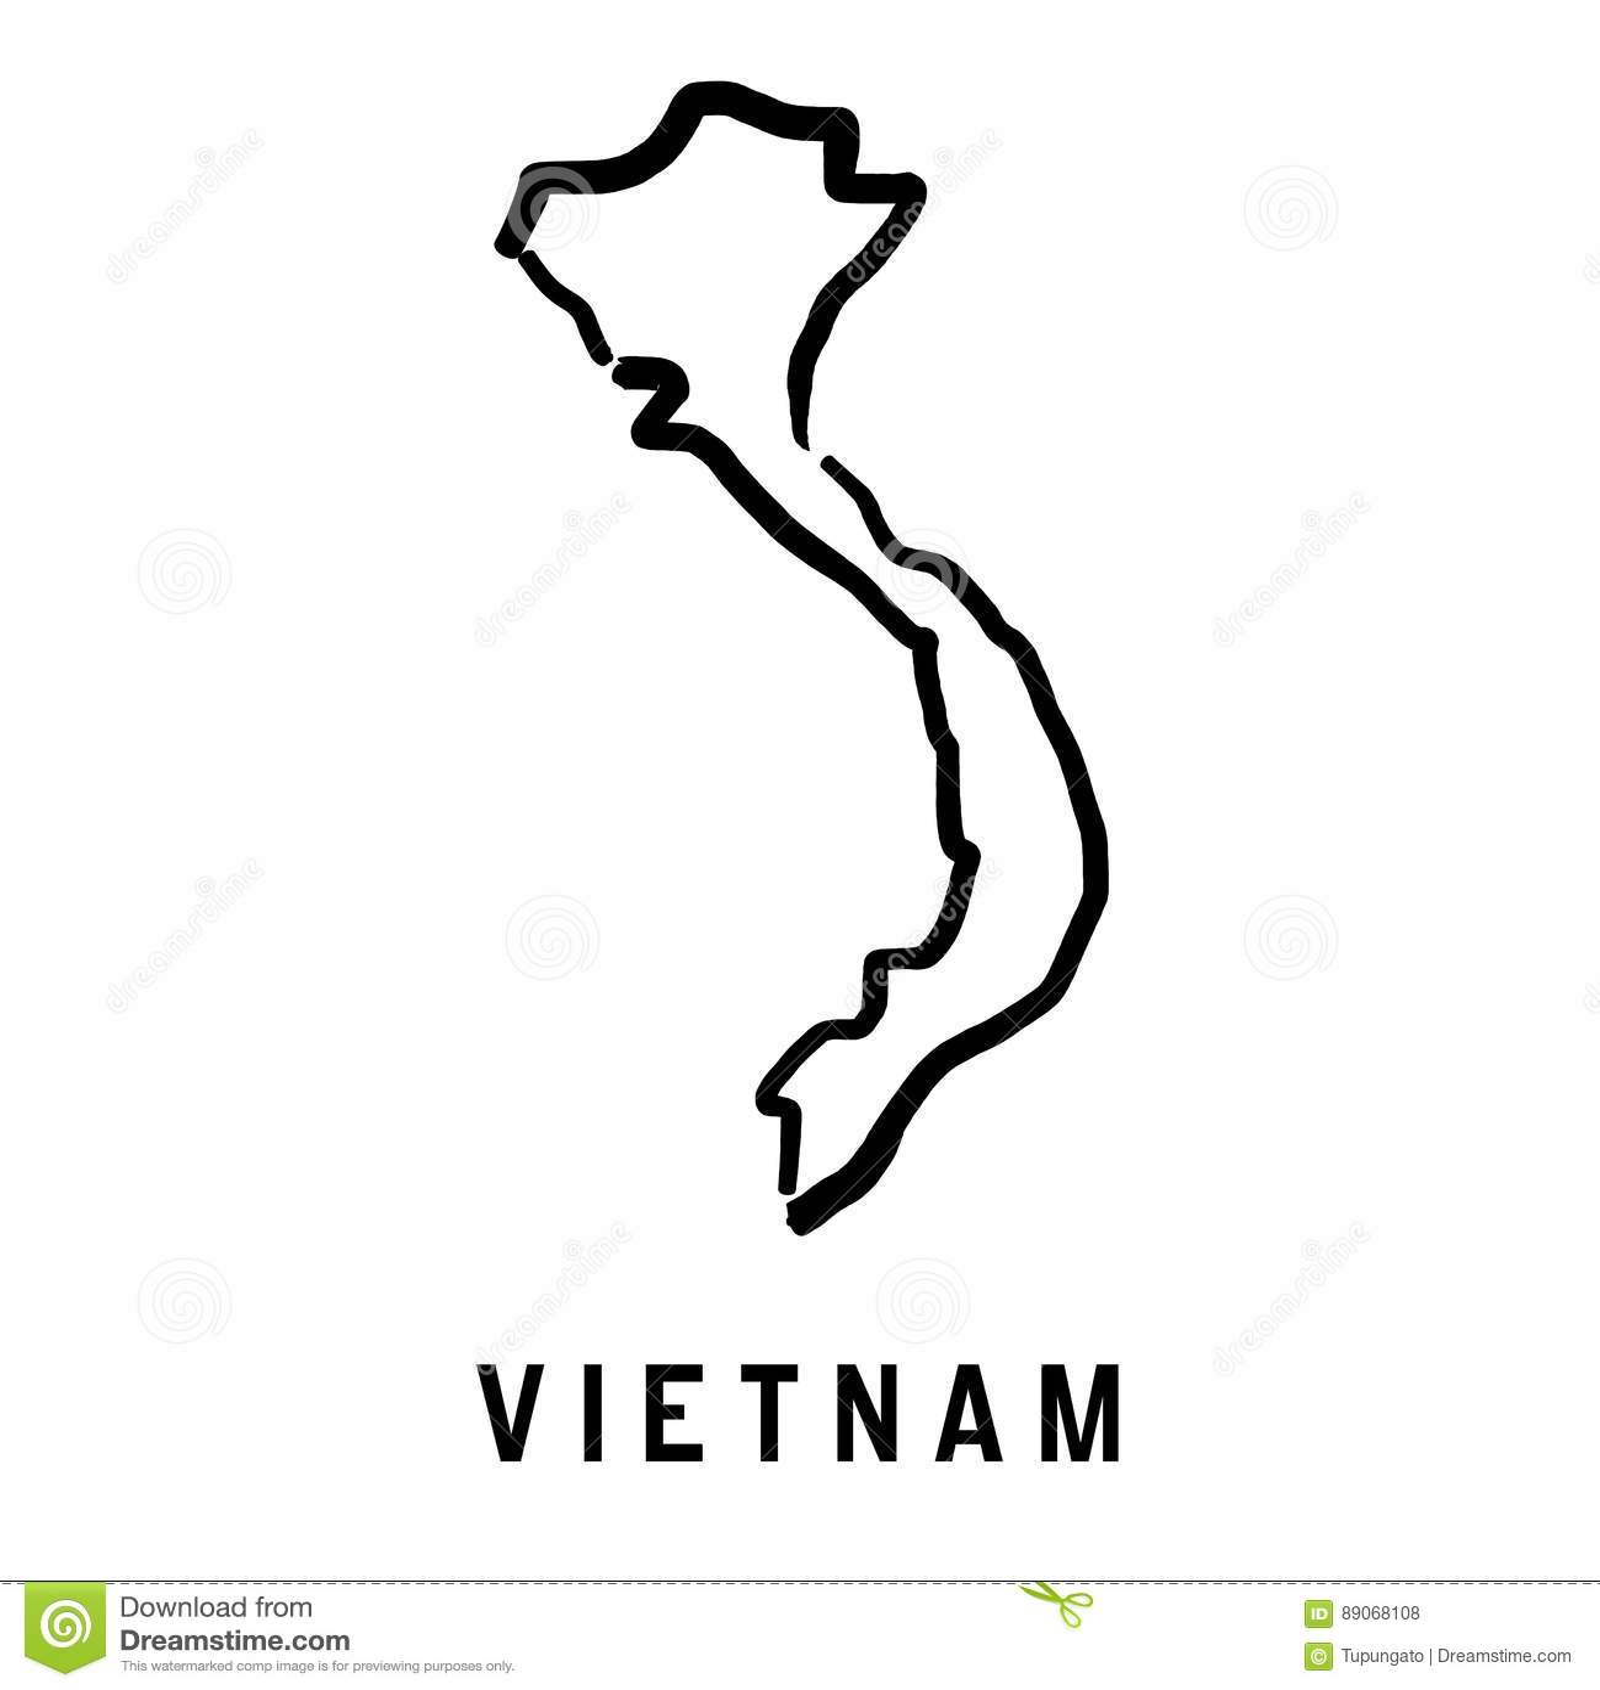 Vietnam Map Outline Stock Vector Illustration Of Asia